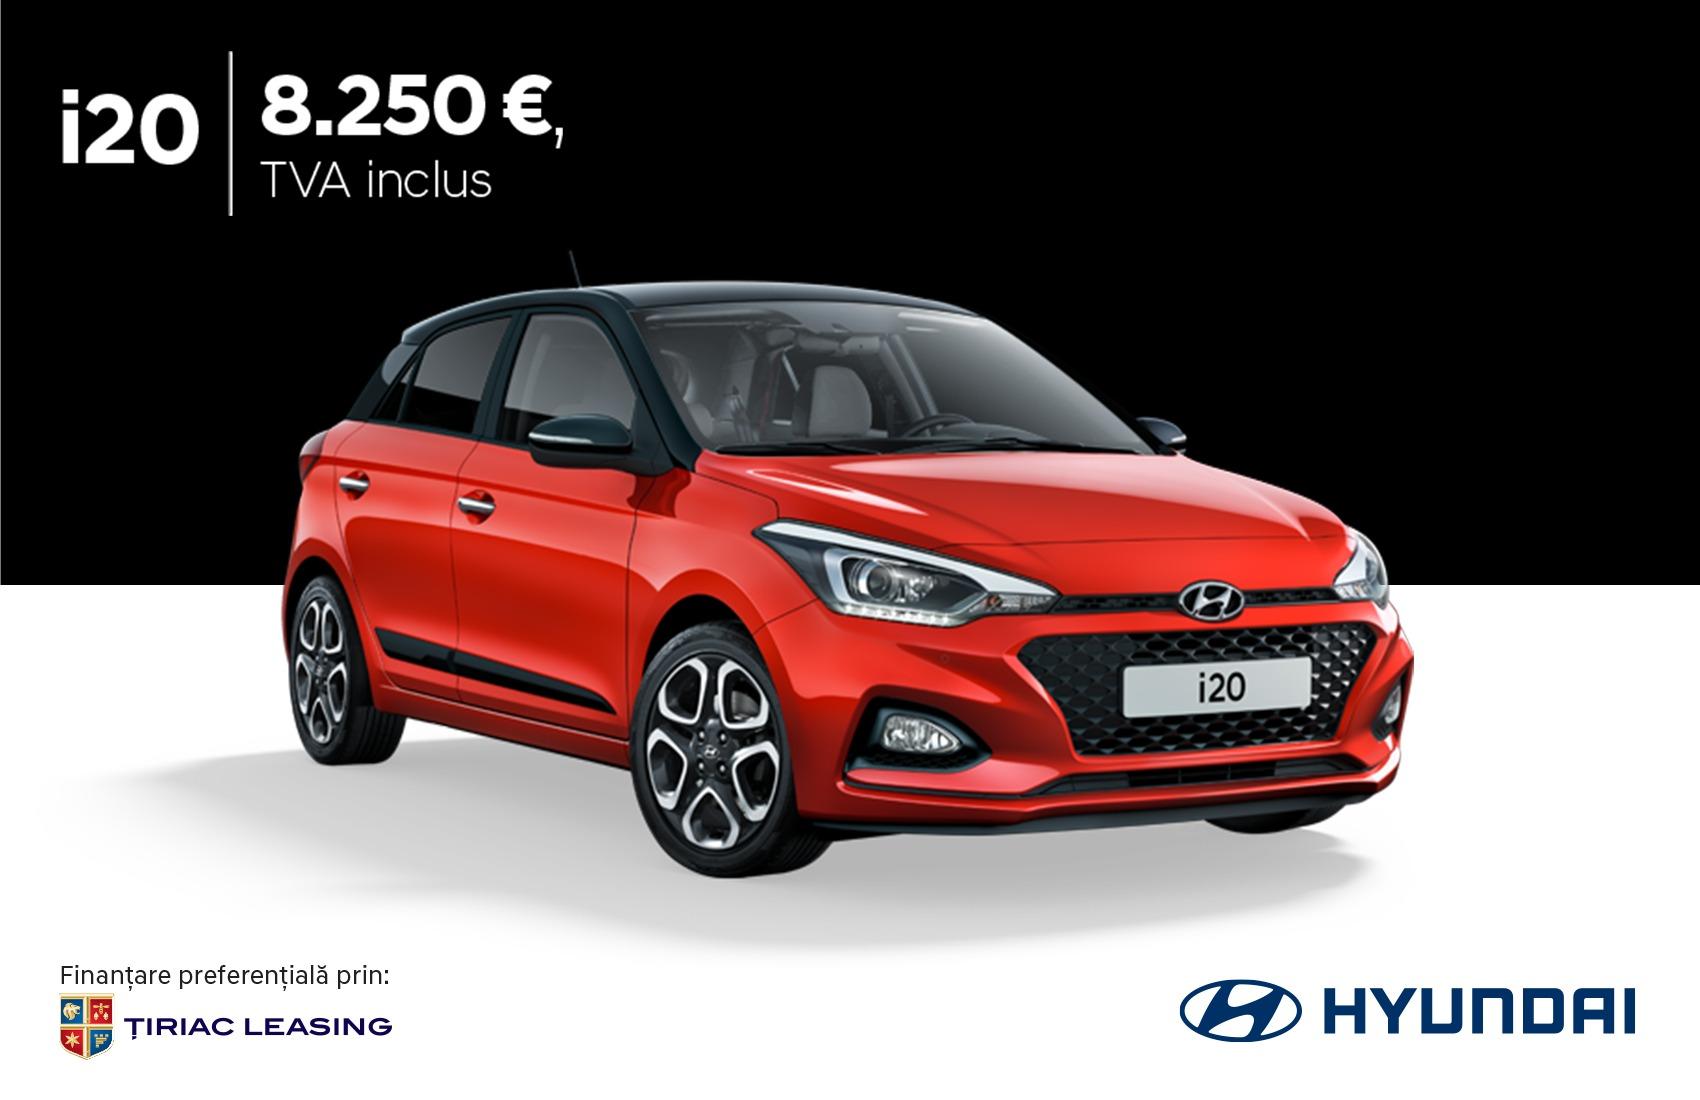 Hyundai i20 prin programul Remat: 8.250 €, TVA inclus